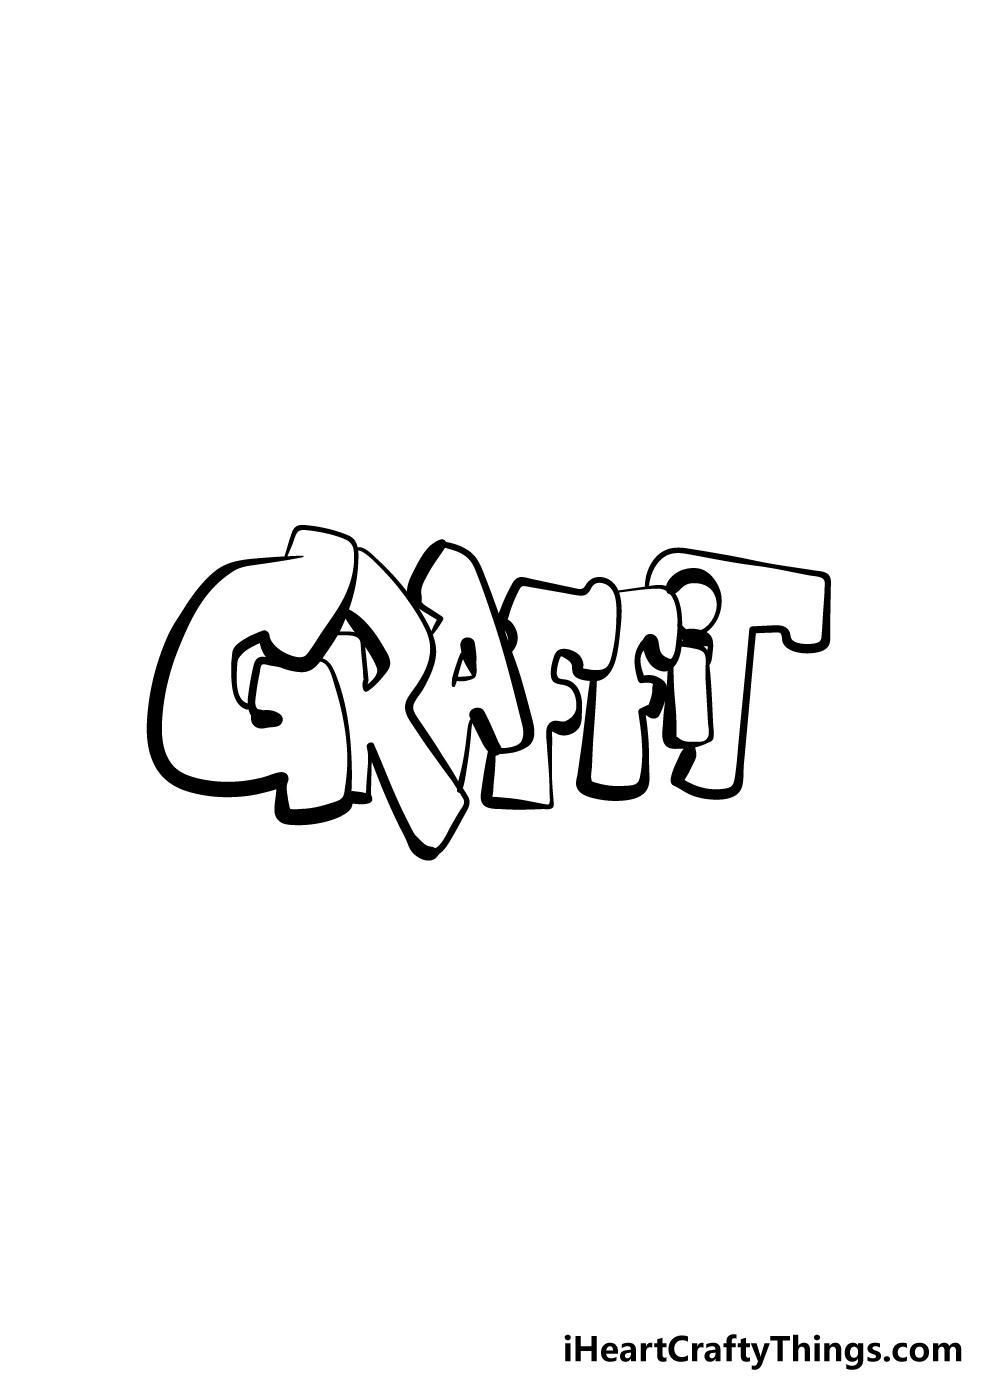 graffiti drawing step 6